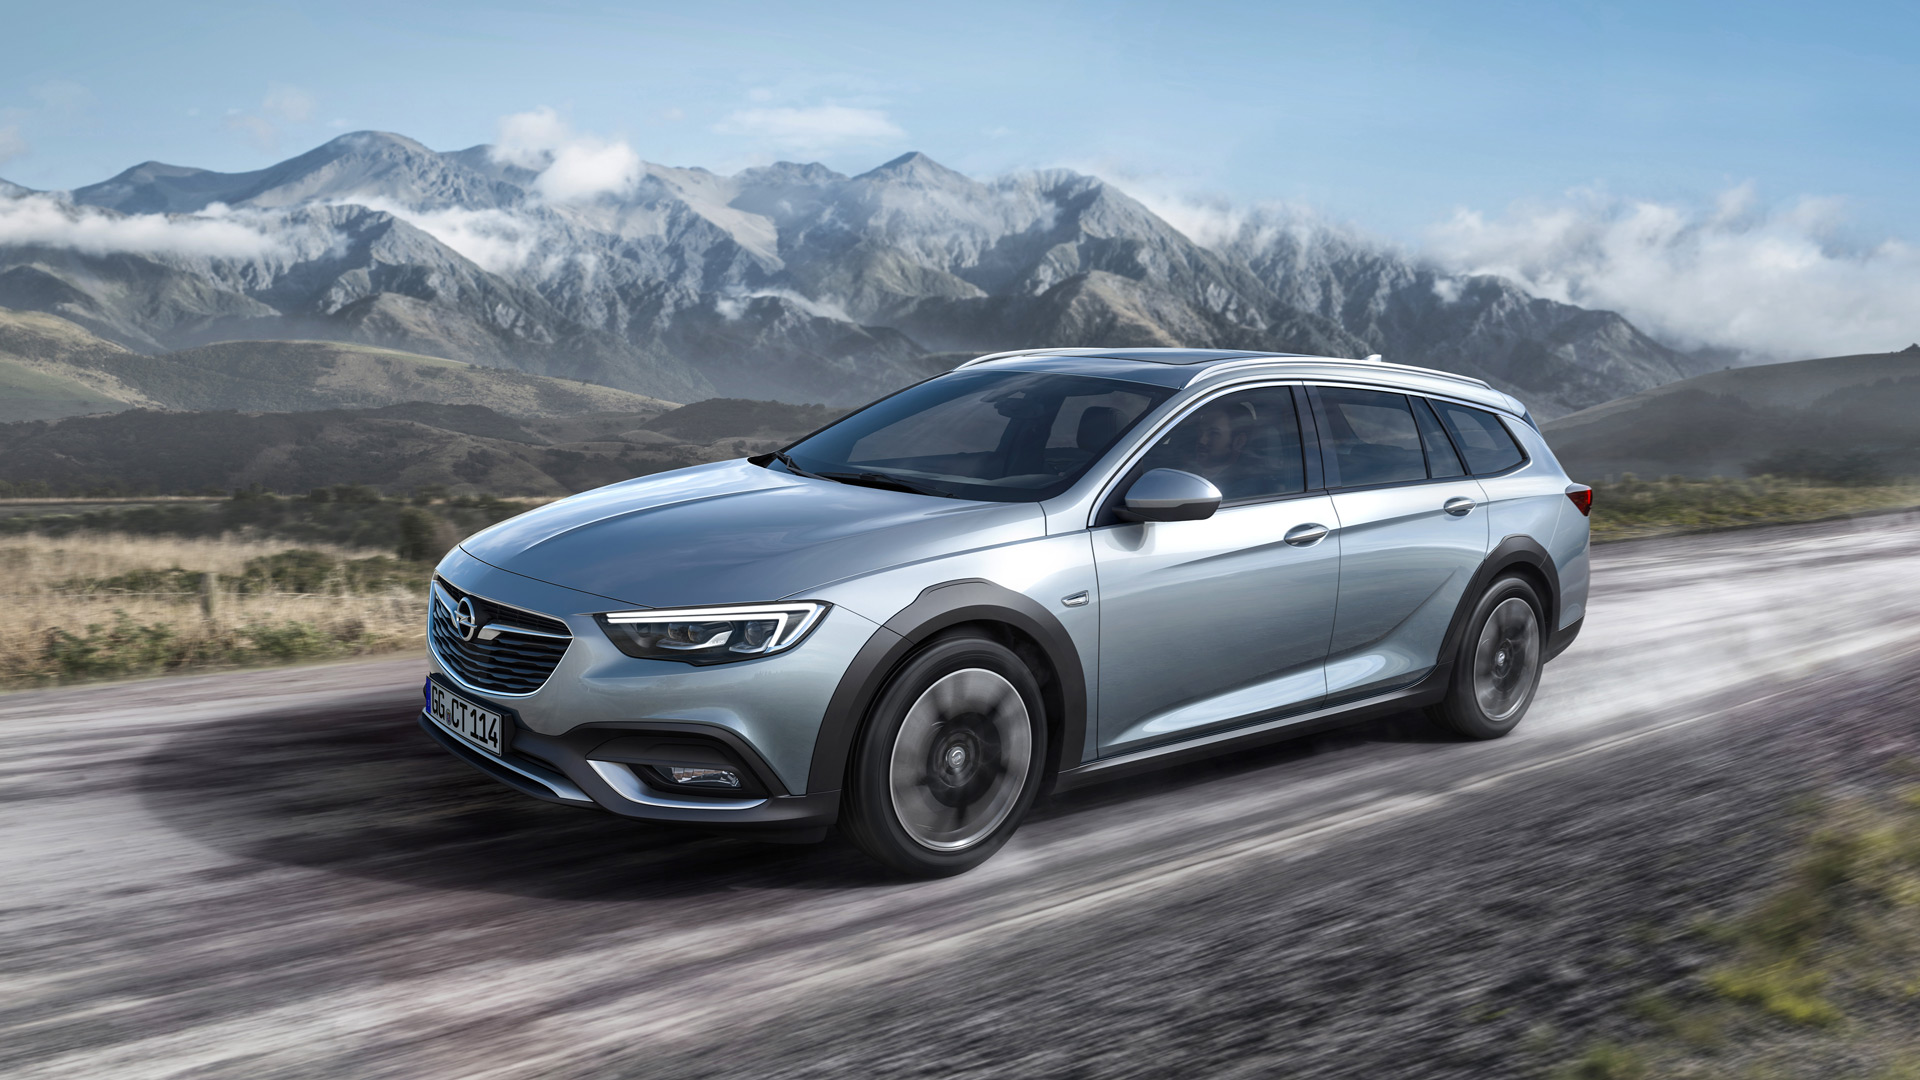 Нови проблеми за Opel и нивните дизел (6d) возила